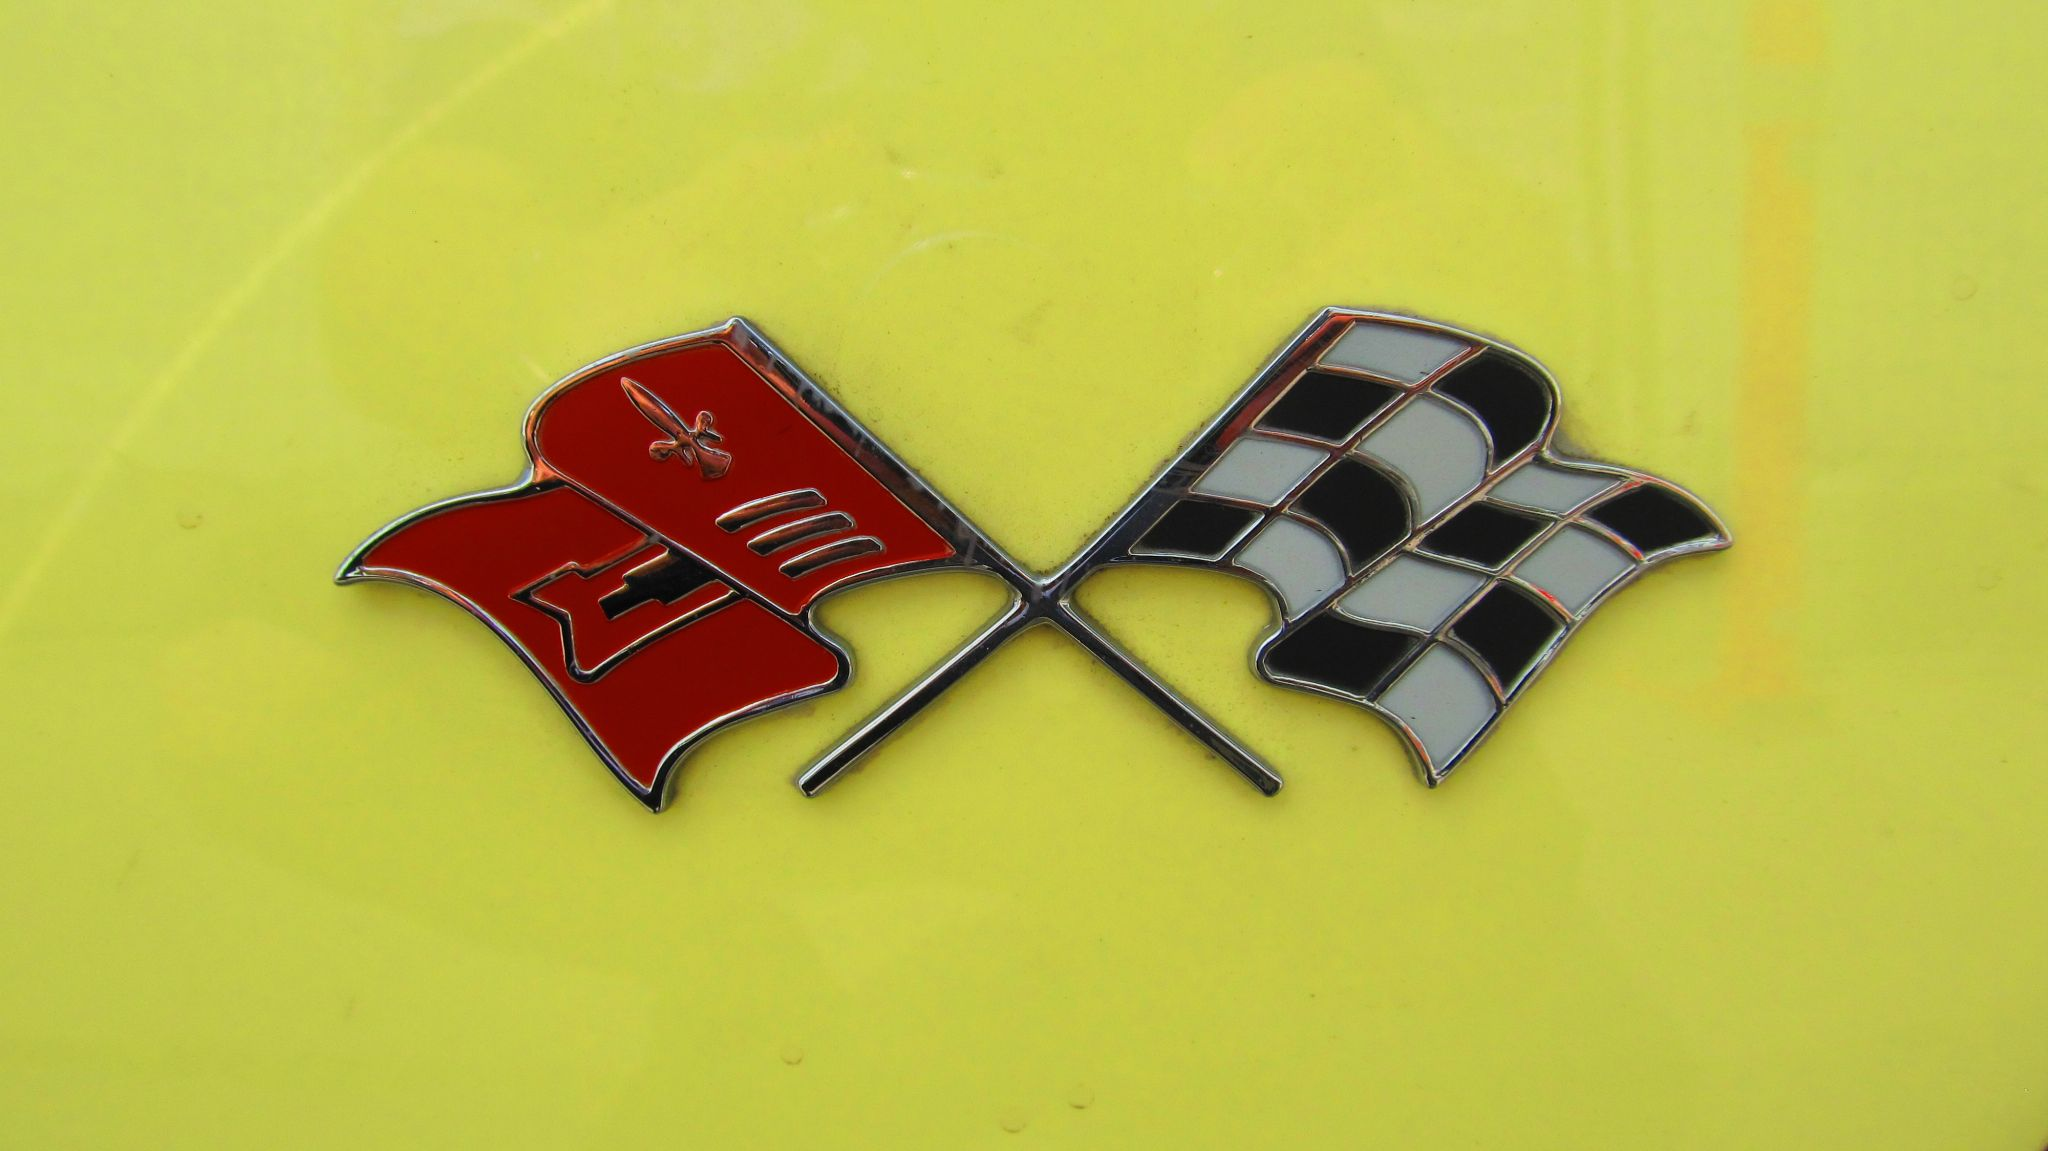 Corvette Emblem by simonp S&R Photography